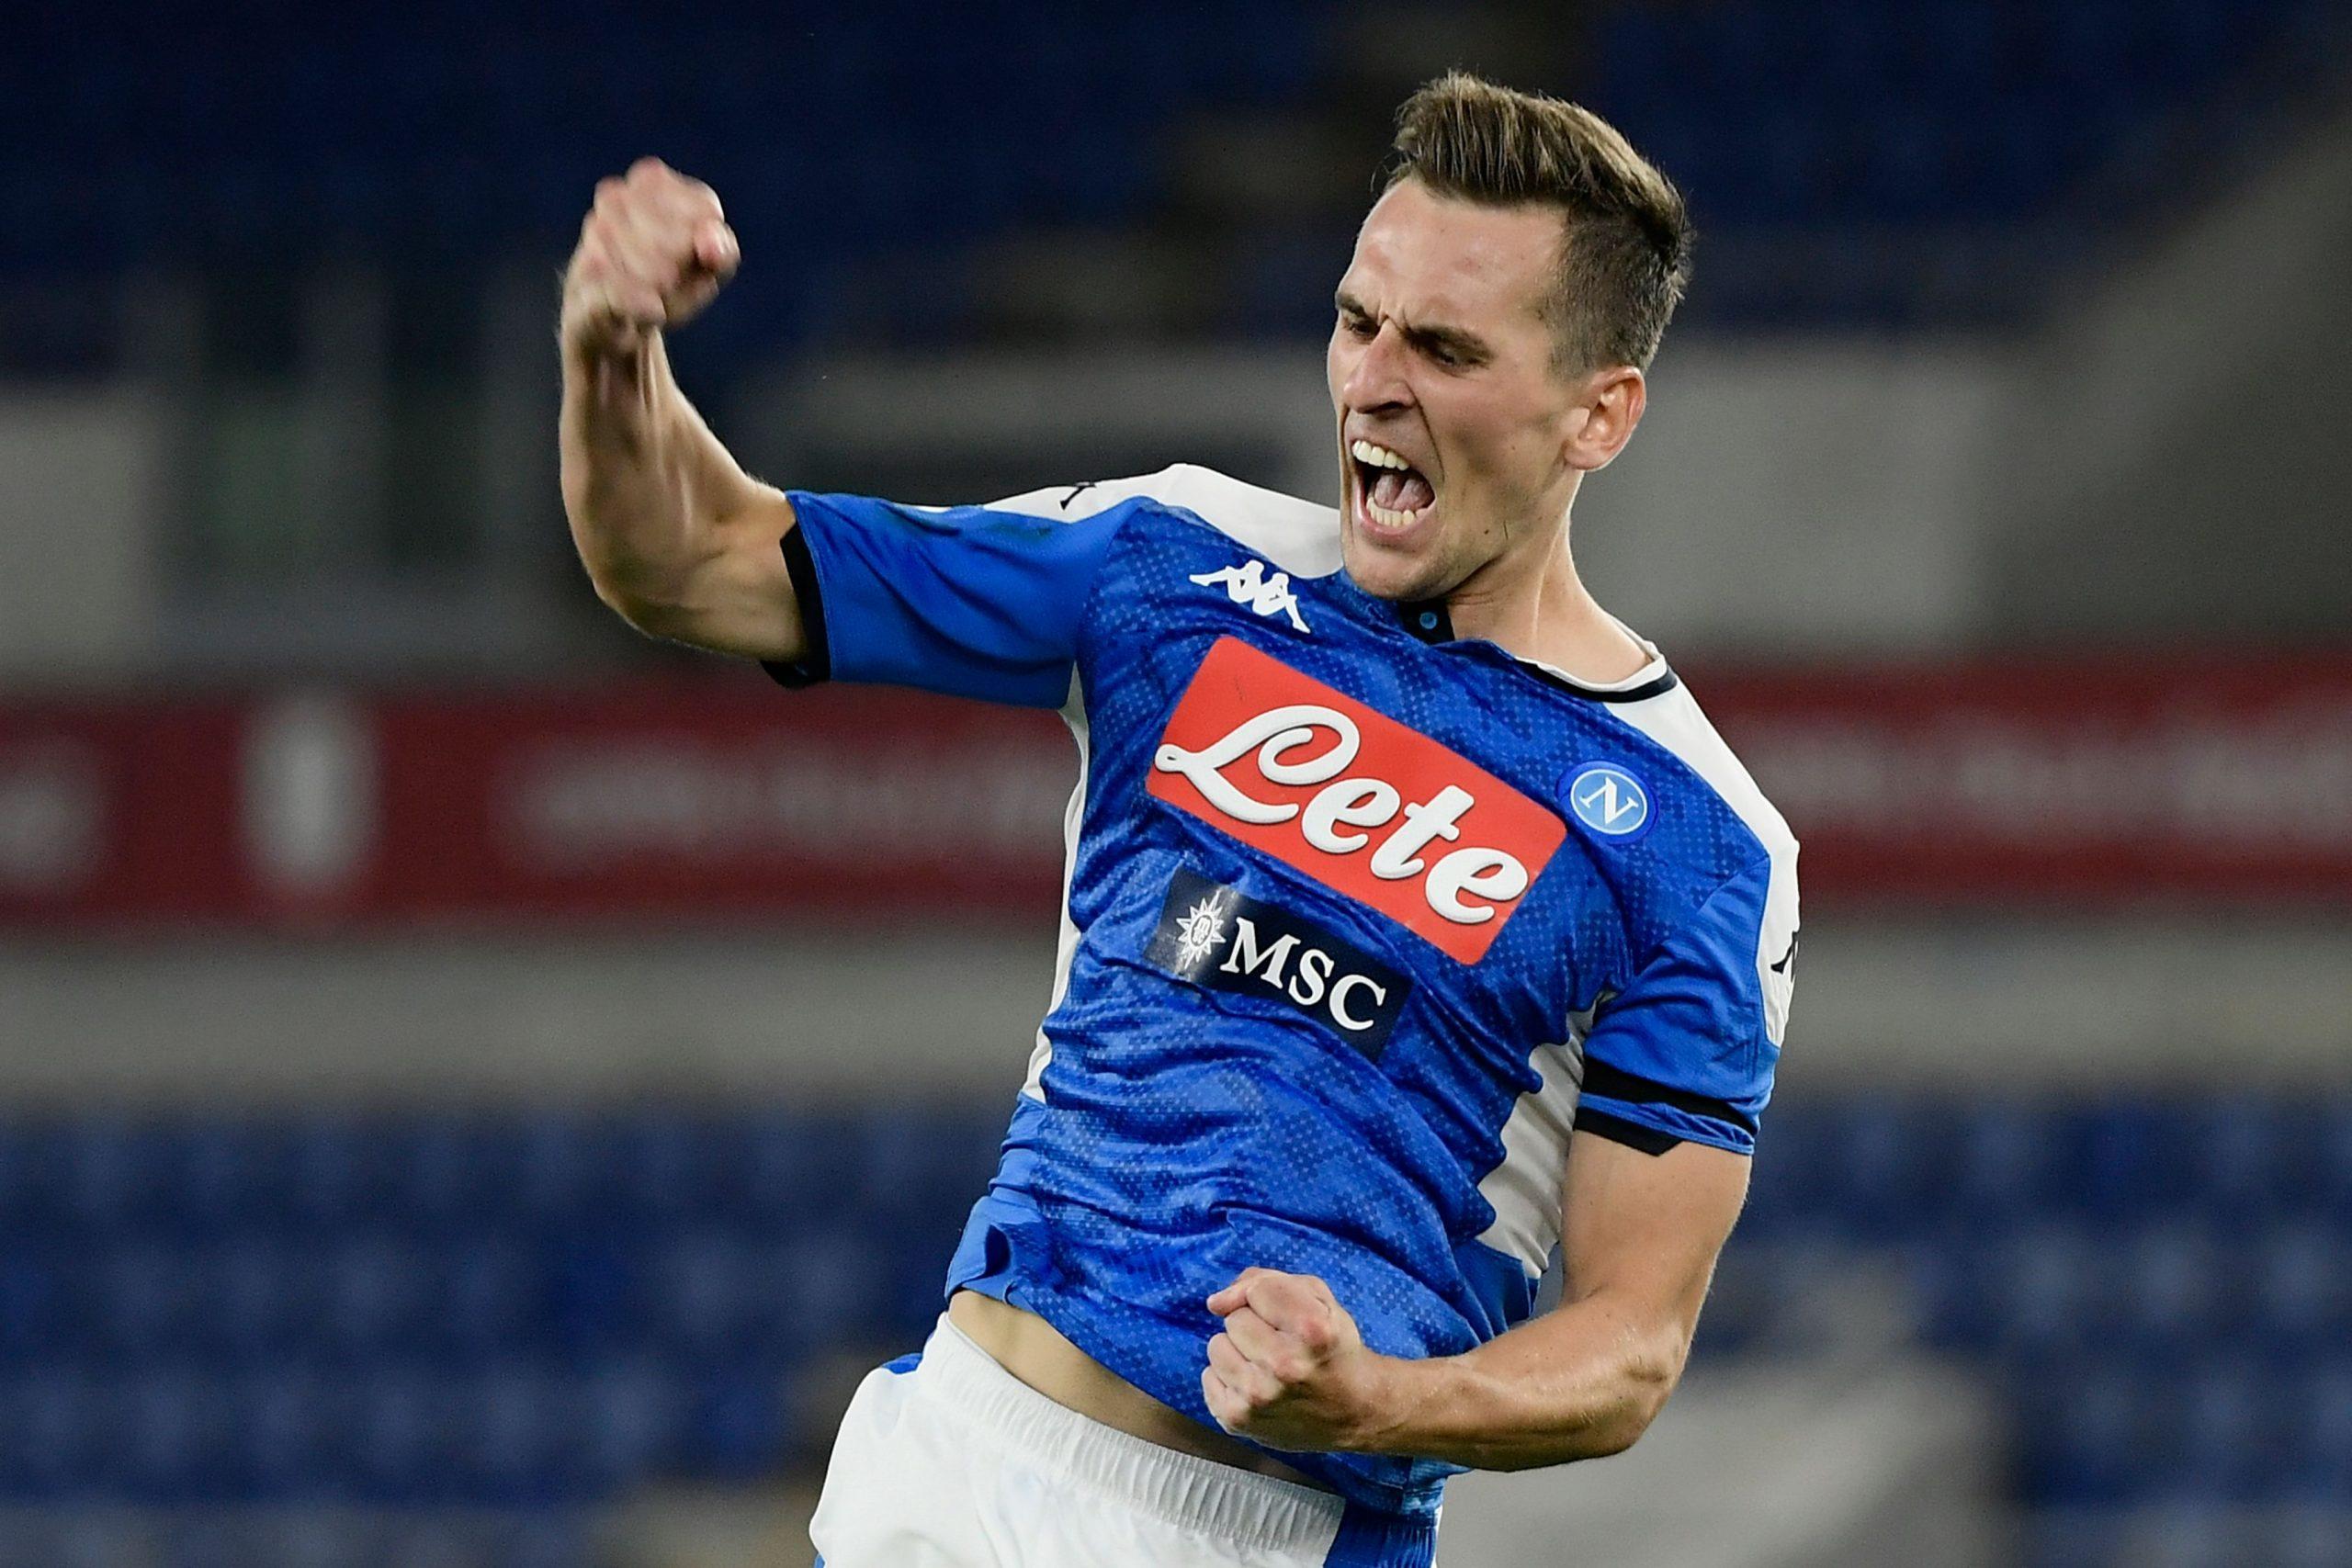 Juventus Vs Napoli Player Ratings Today 3lzzoyjxhieckm